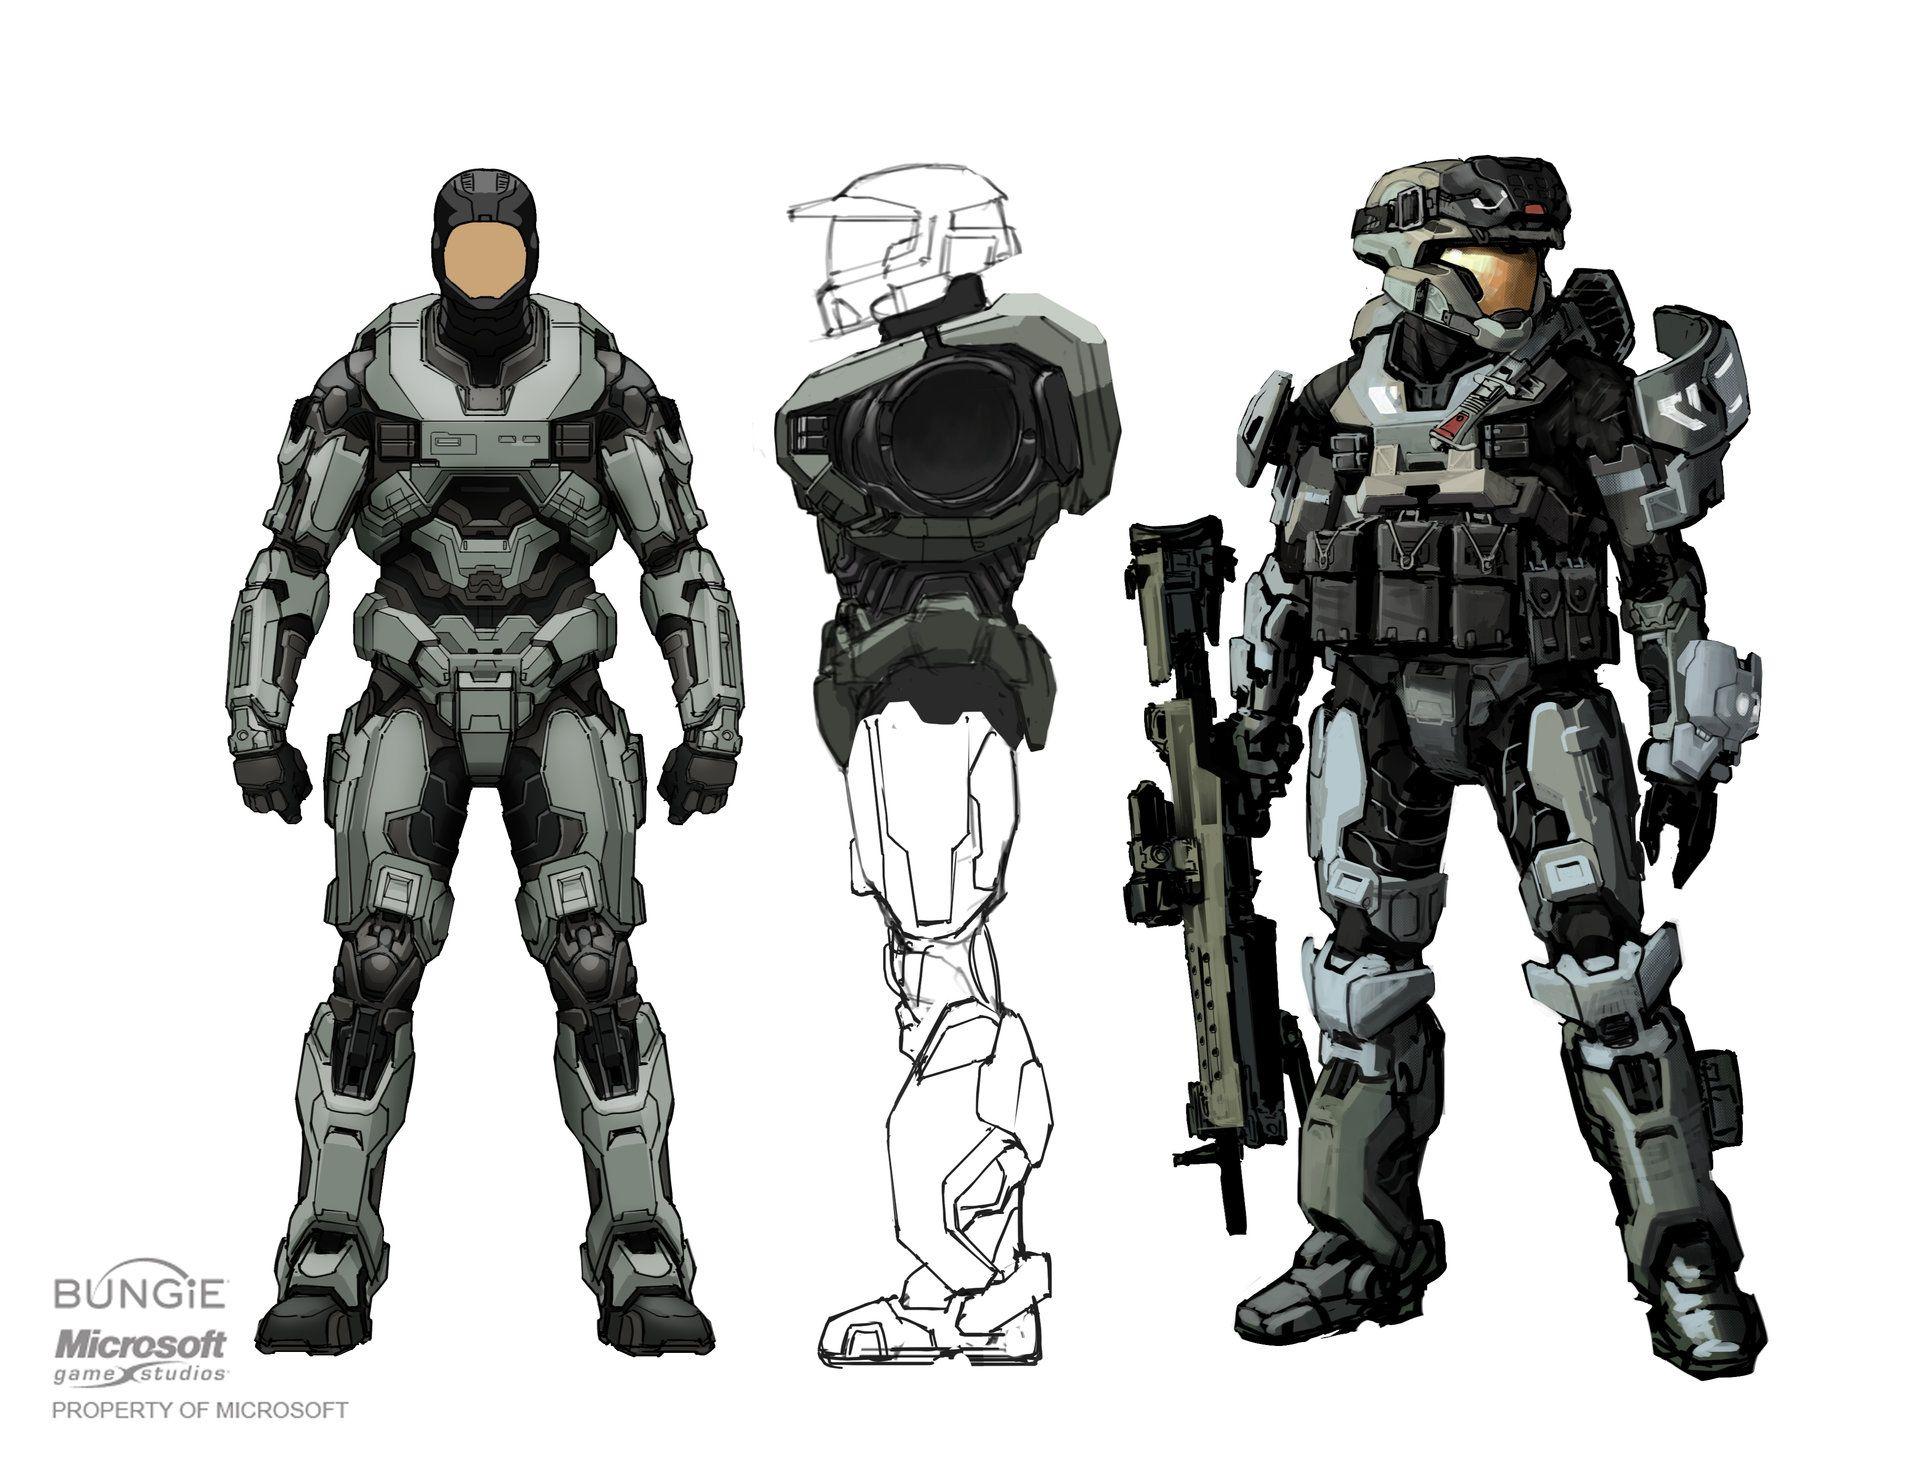 High Quality Concept Armor Pic.jpg